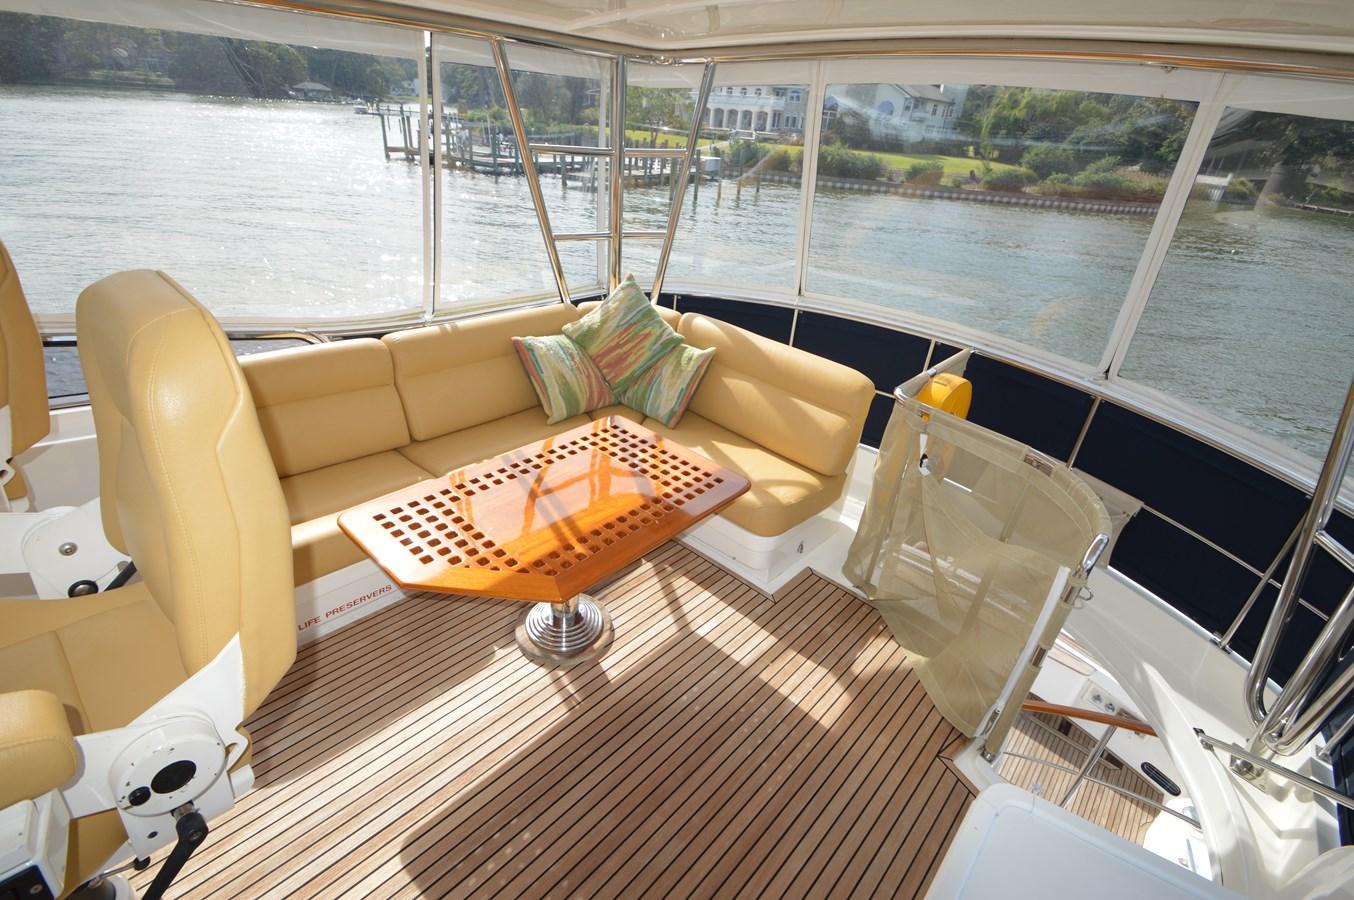 95 2004 GRAND BANKS 58 Eastbay Motor Yacht 2714820